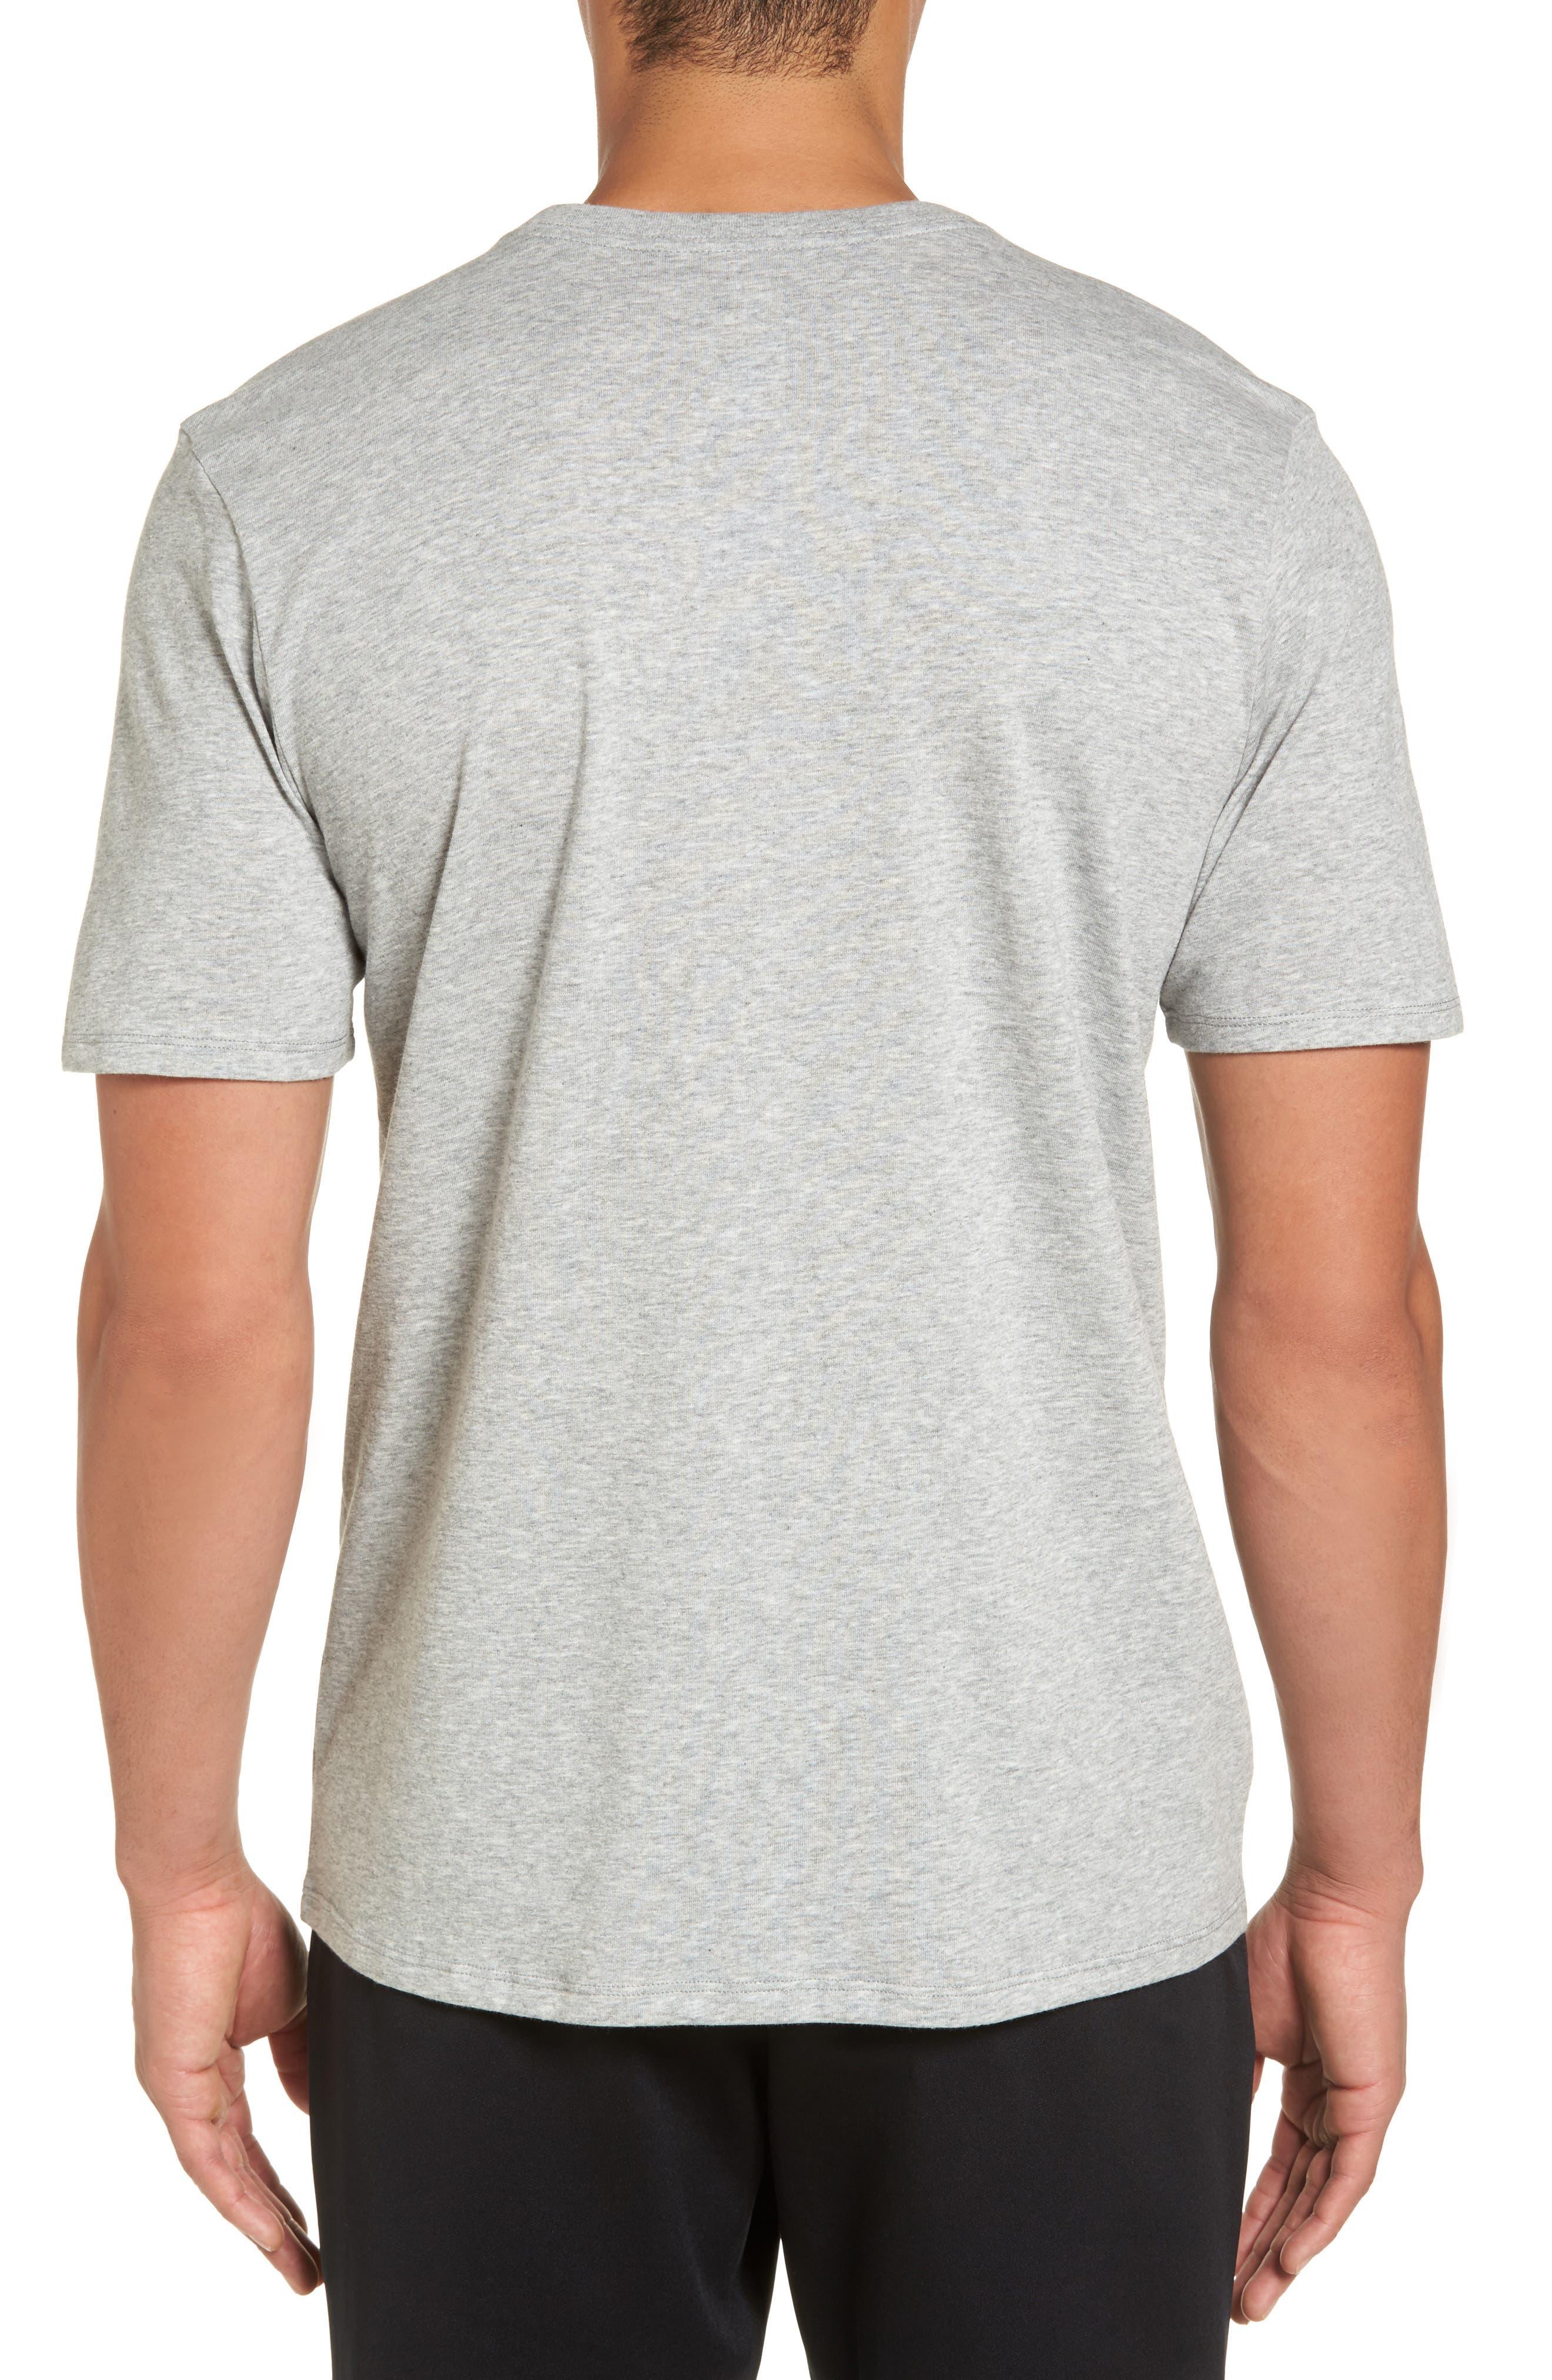 Alternate Image 2  - Nike Dry No Excuses Training T-Shirt